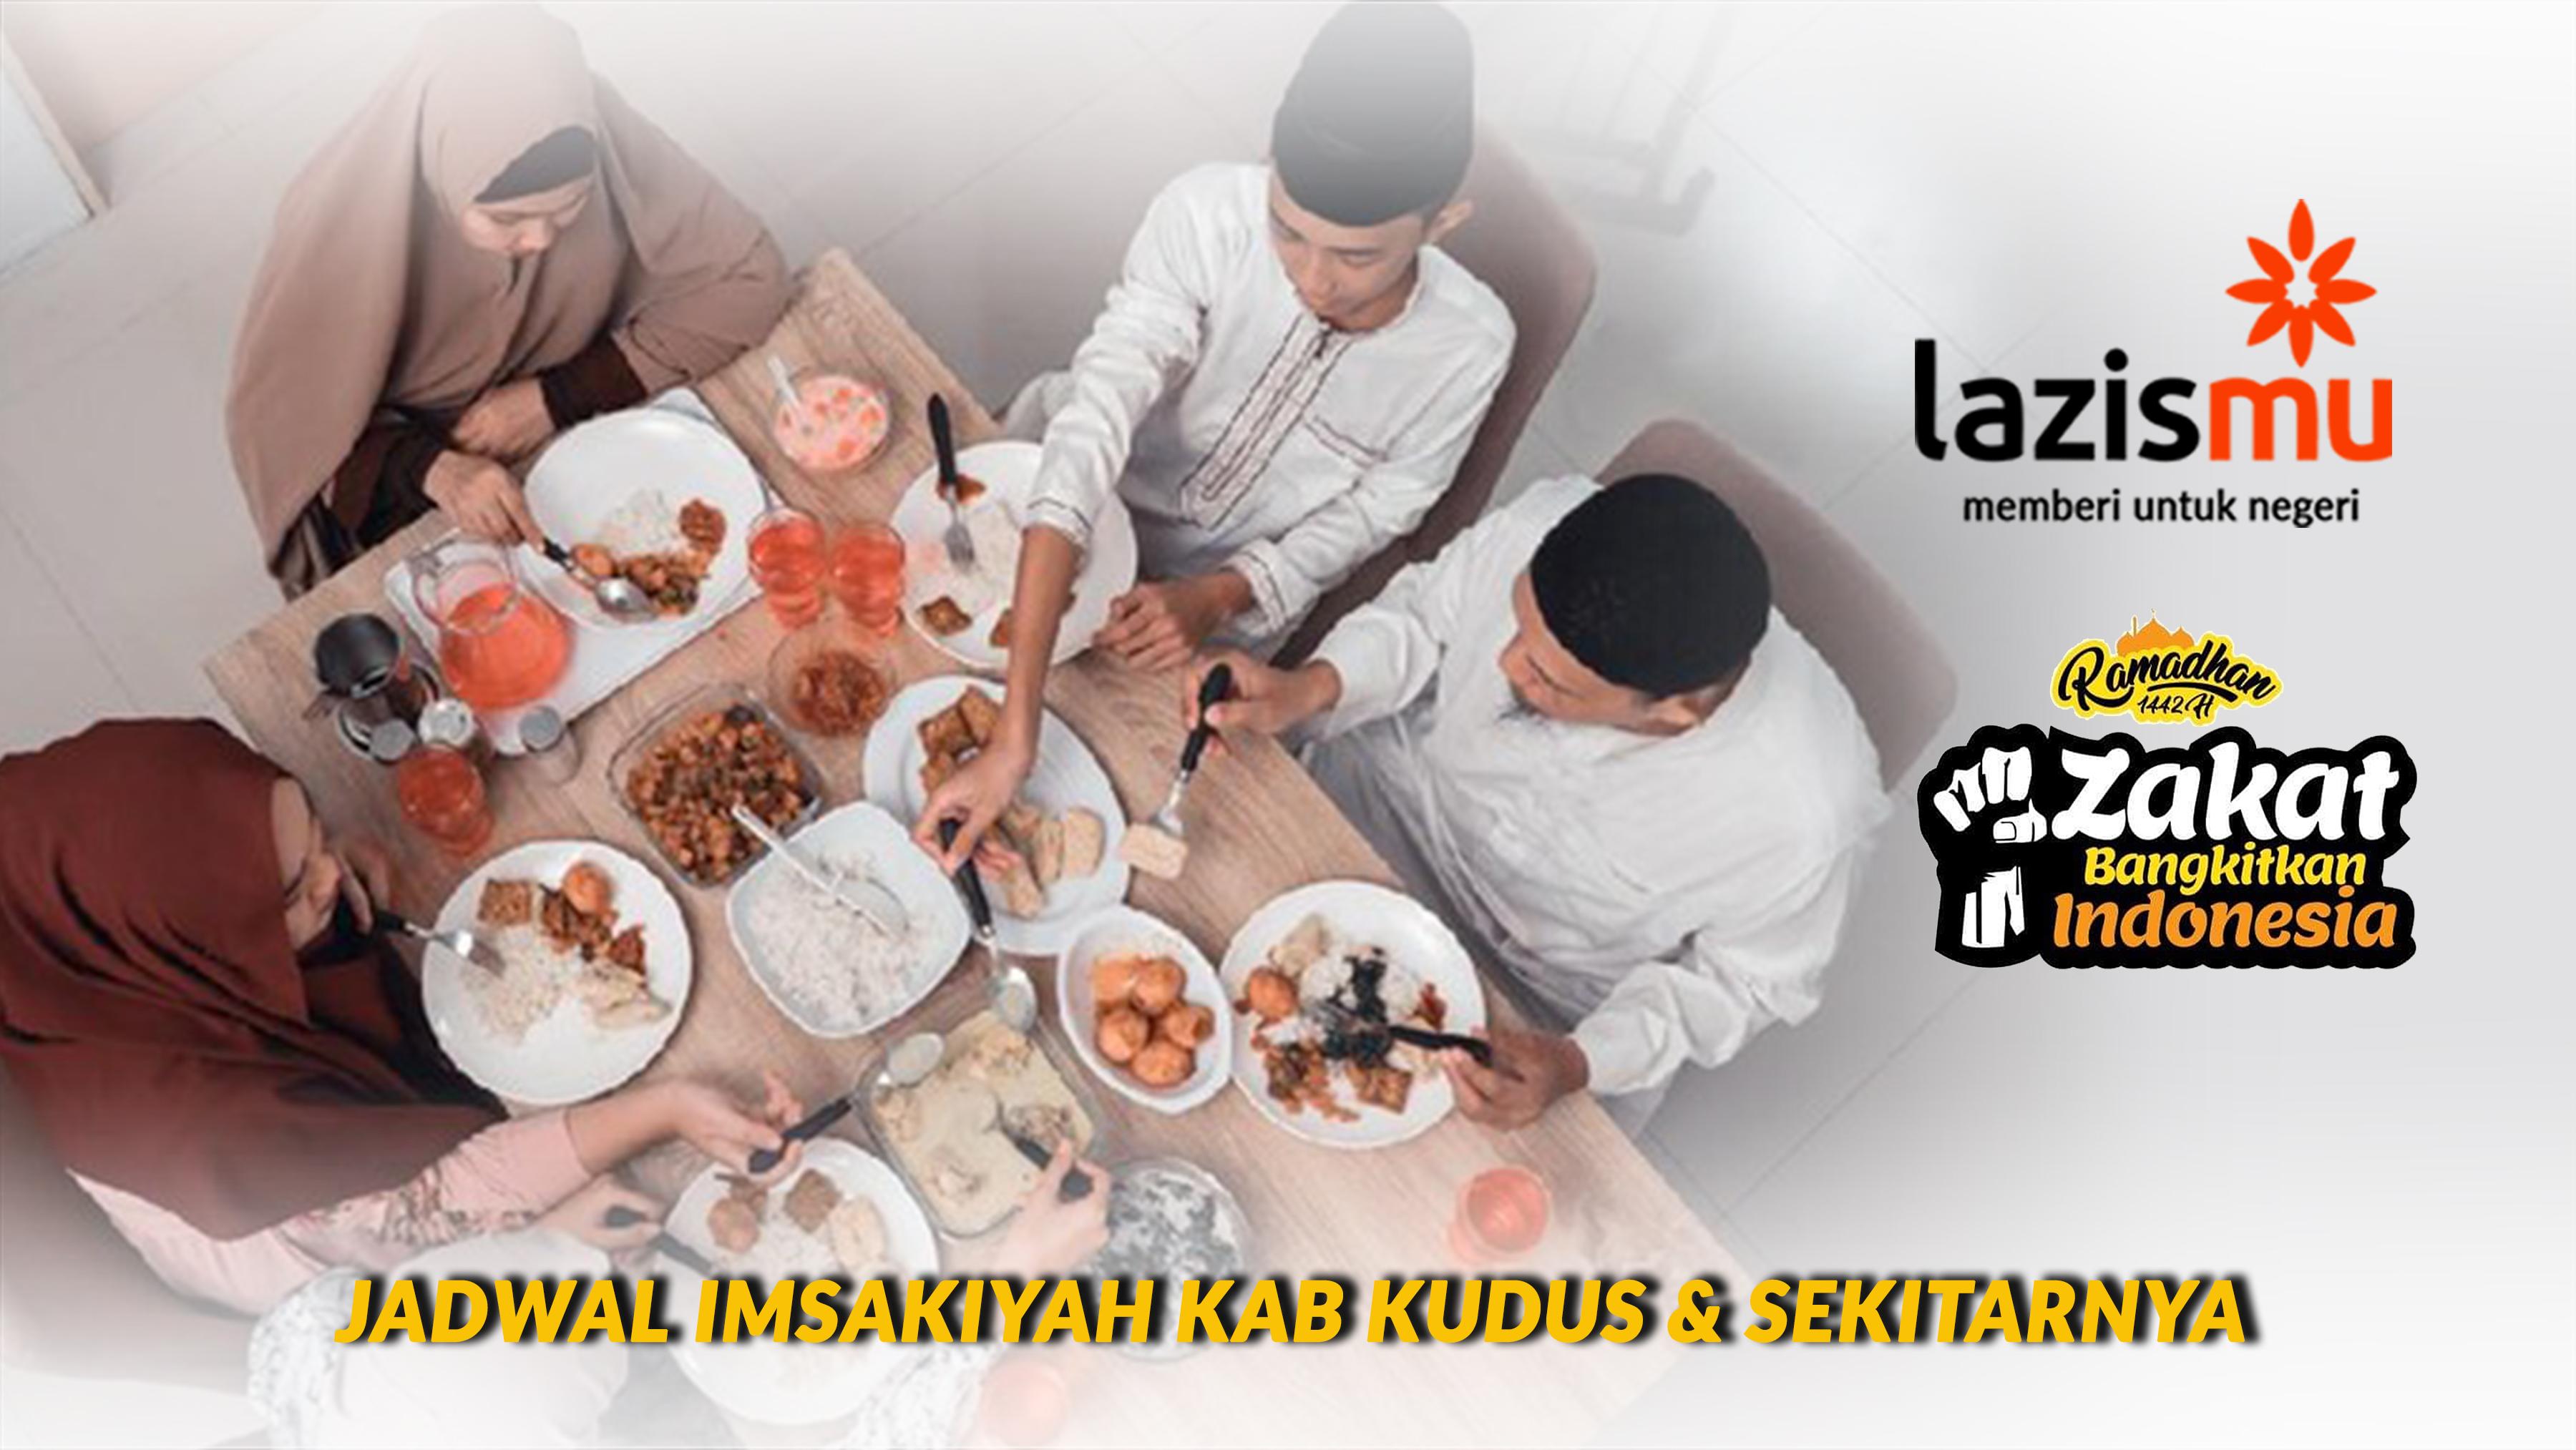 Jadwal Imsakiyah Ramadhan 1442 H Kab Kudus Sekitarnya Lazismu Kudus